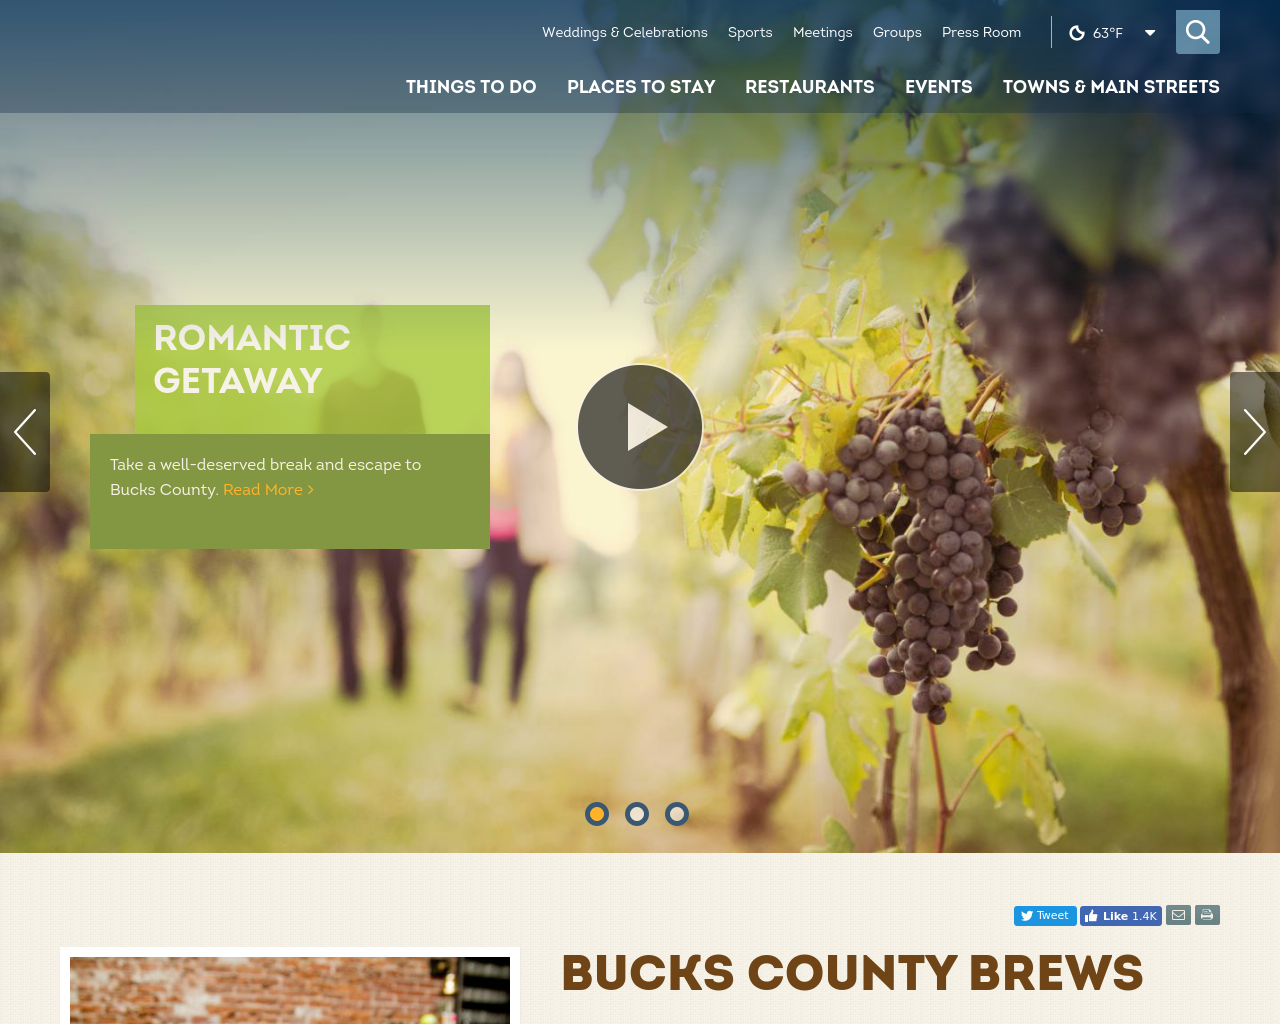 Visit-Bucks-County-Advertising-Reviews-Pricing